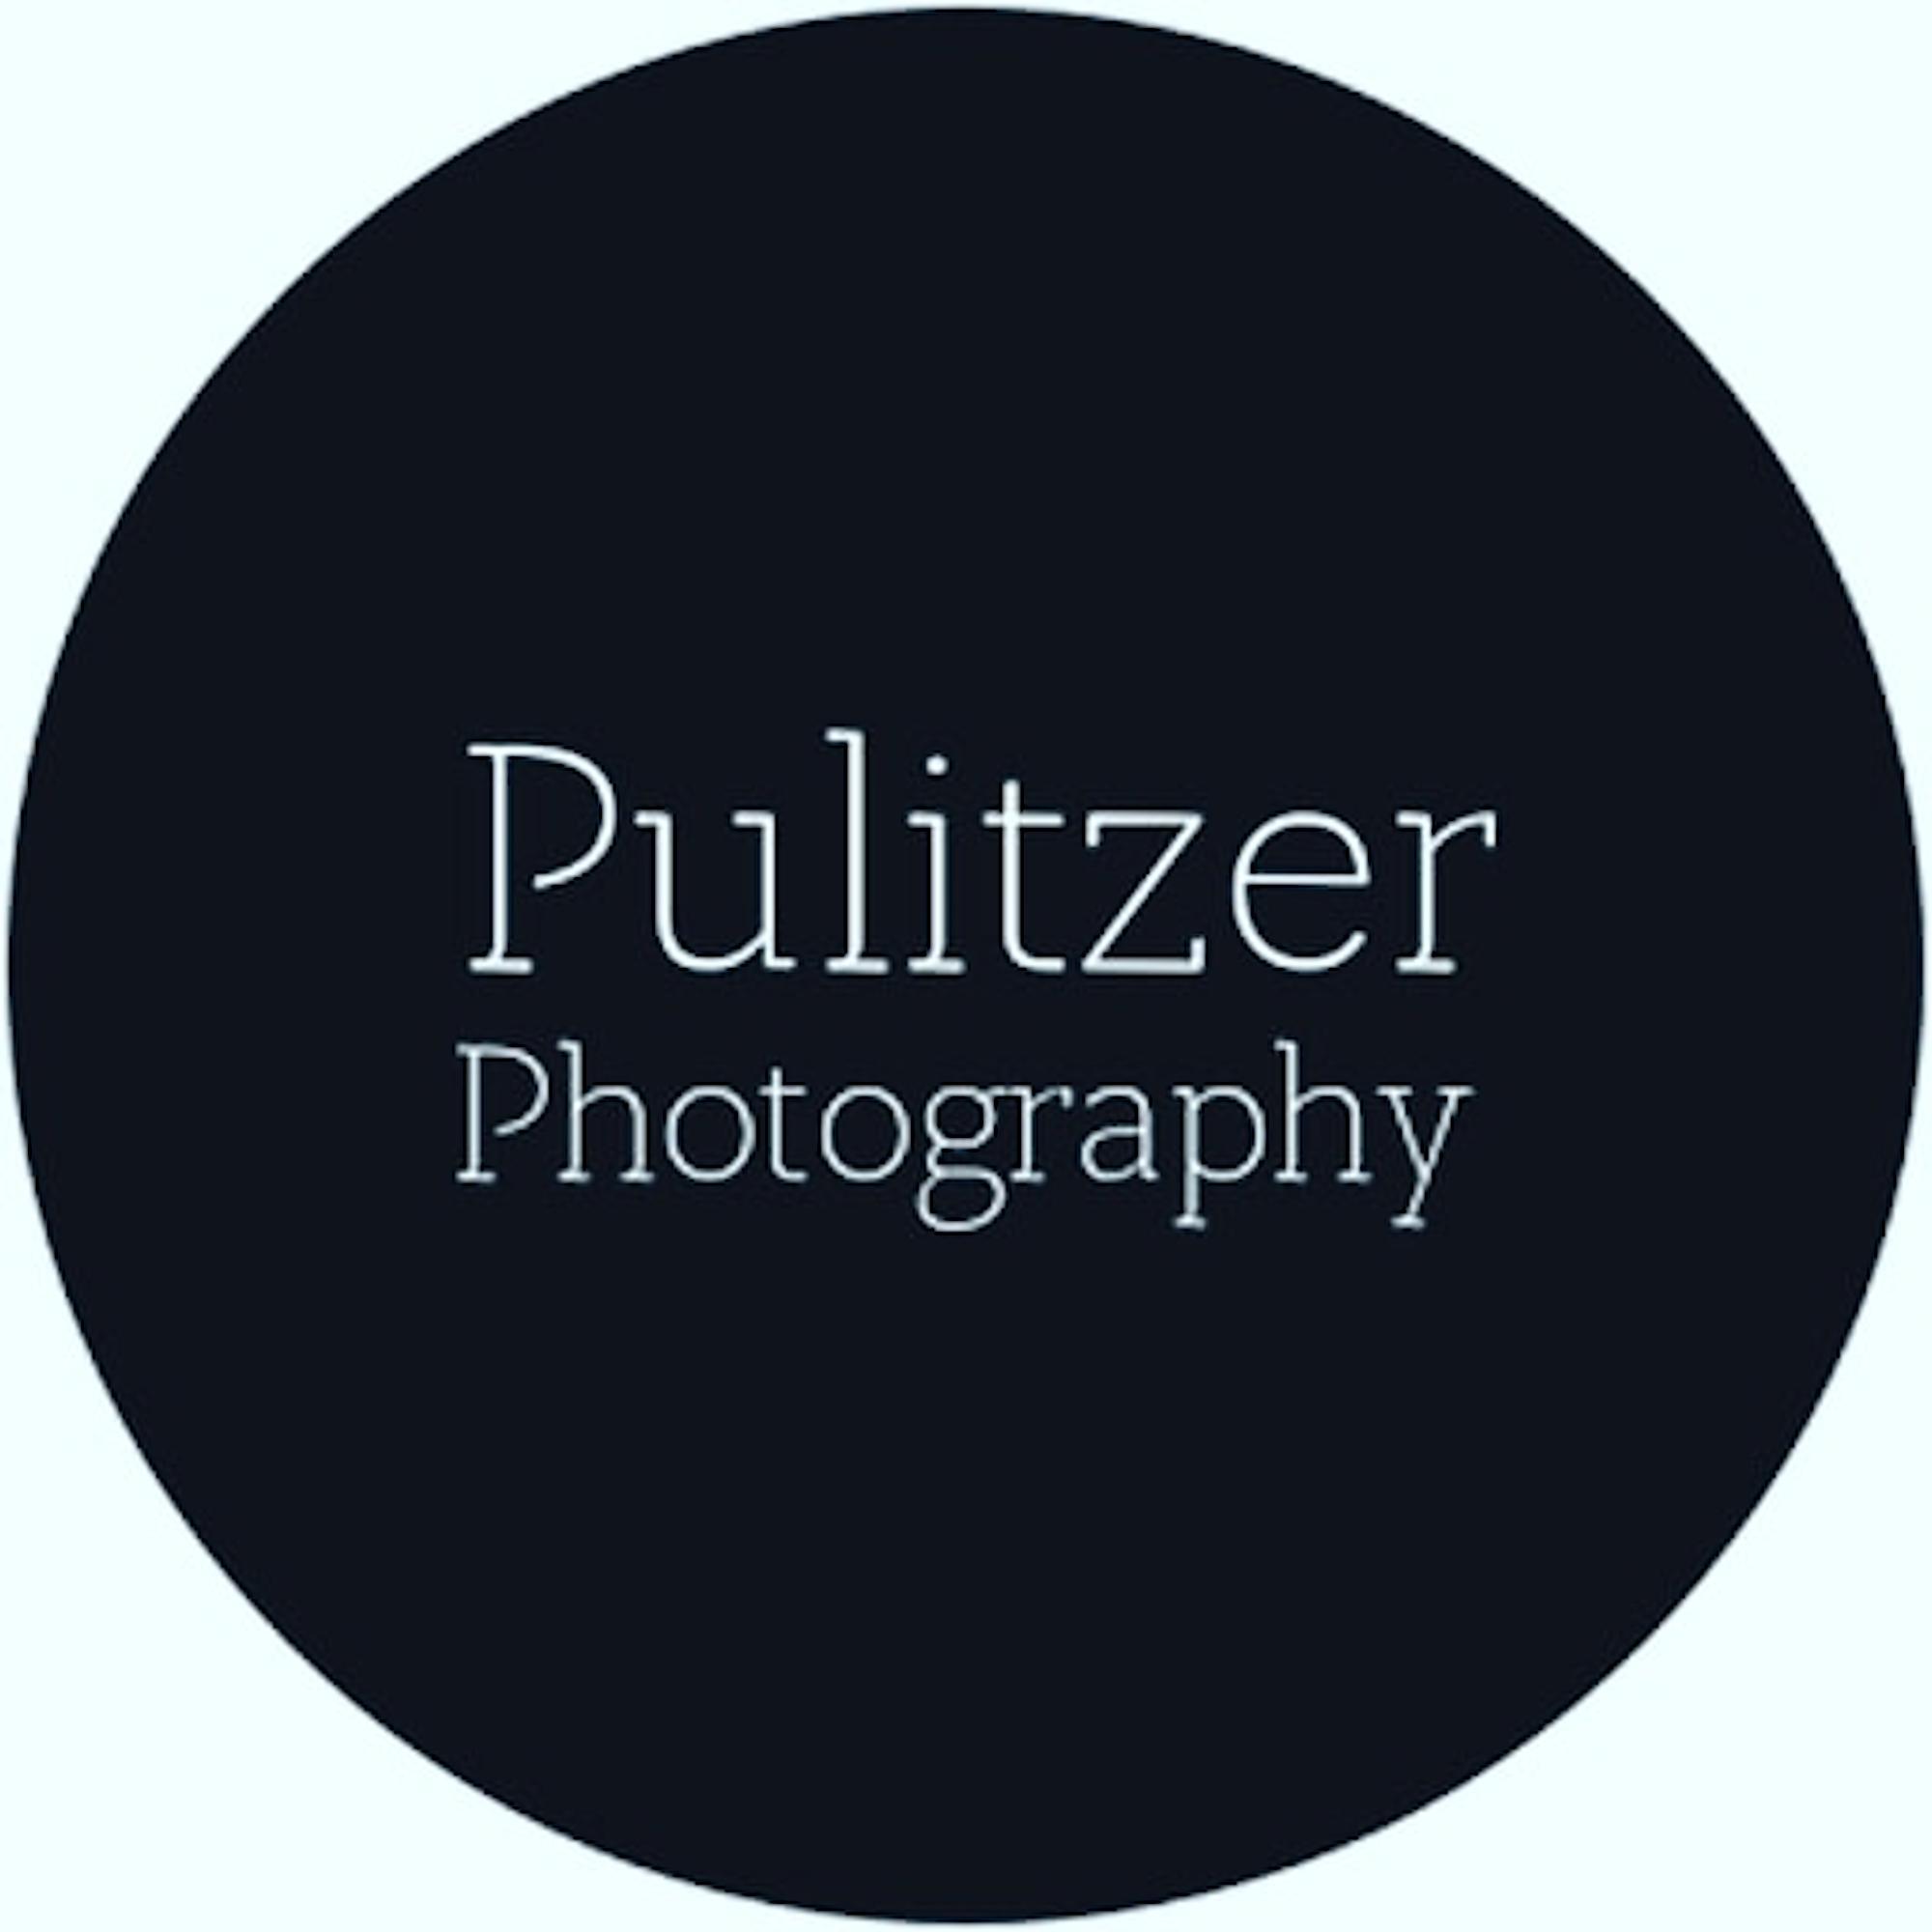 Pulitzer Photography